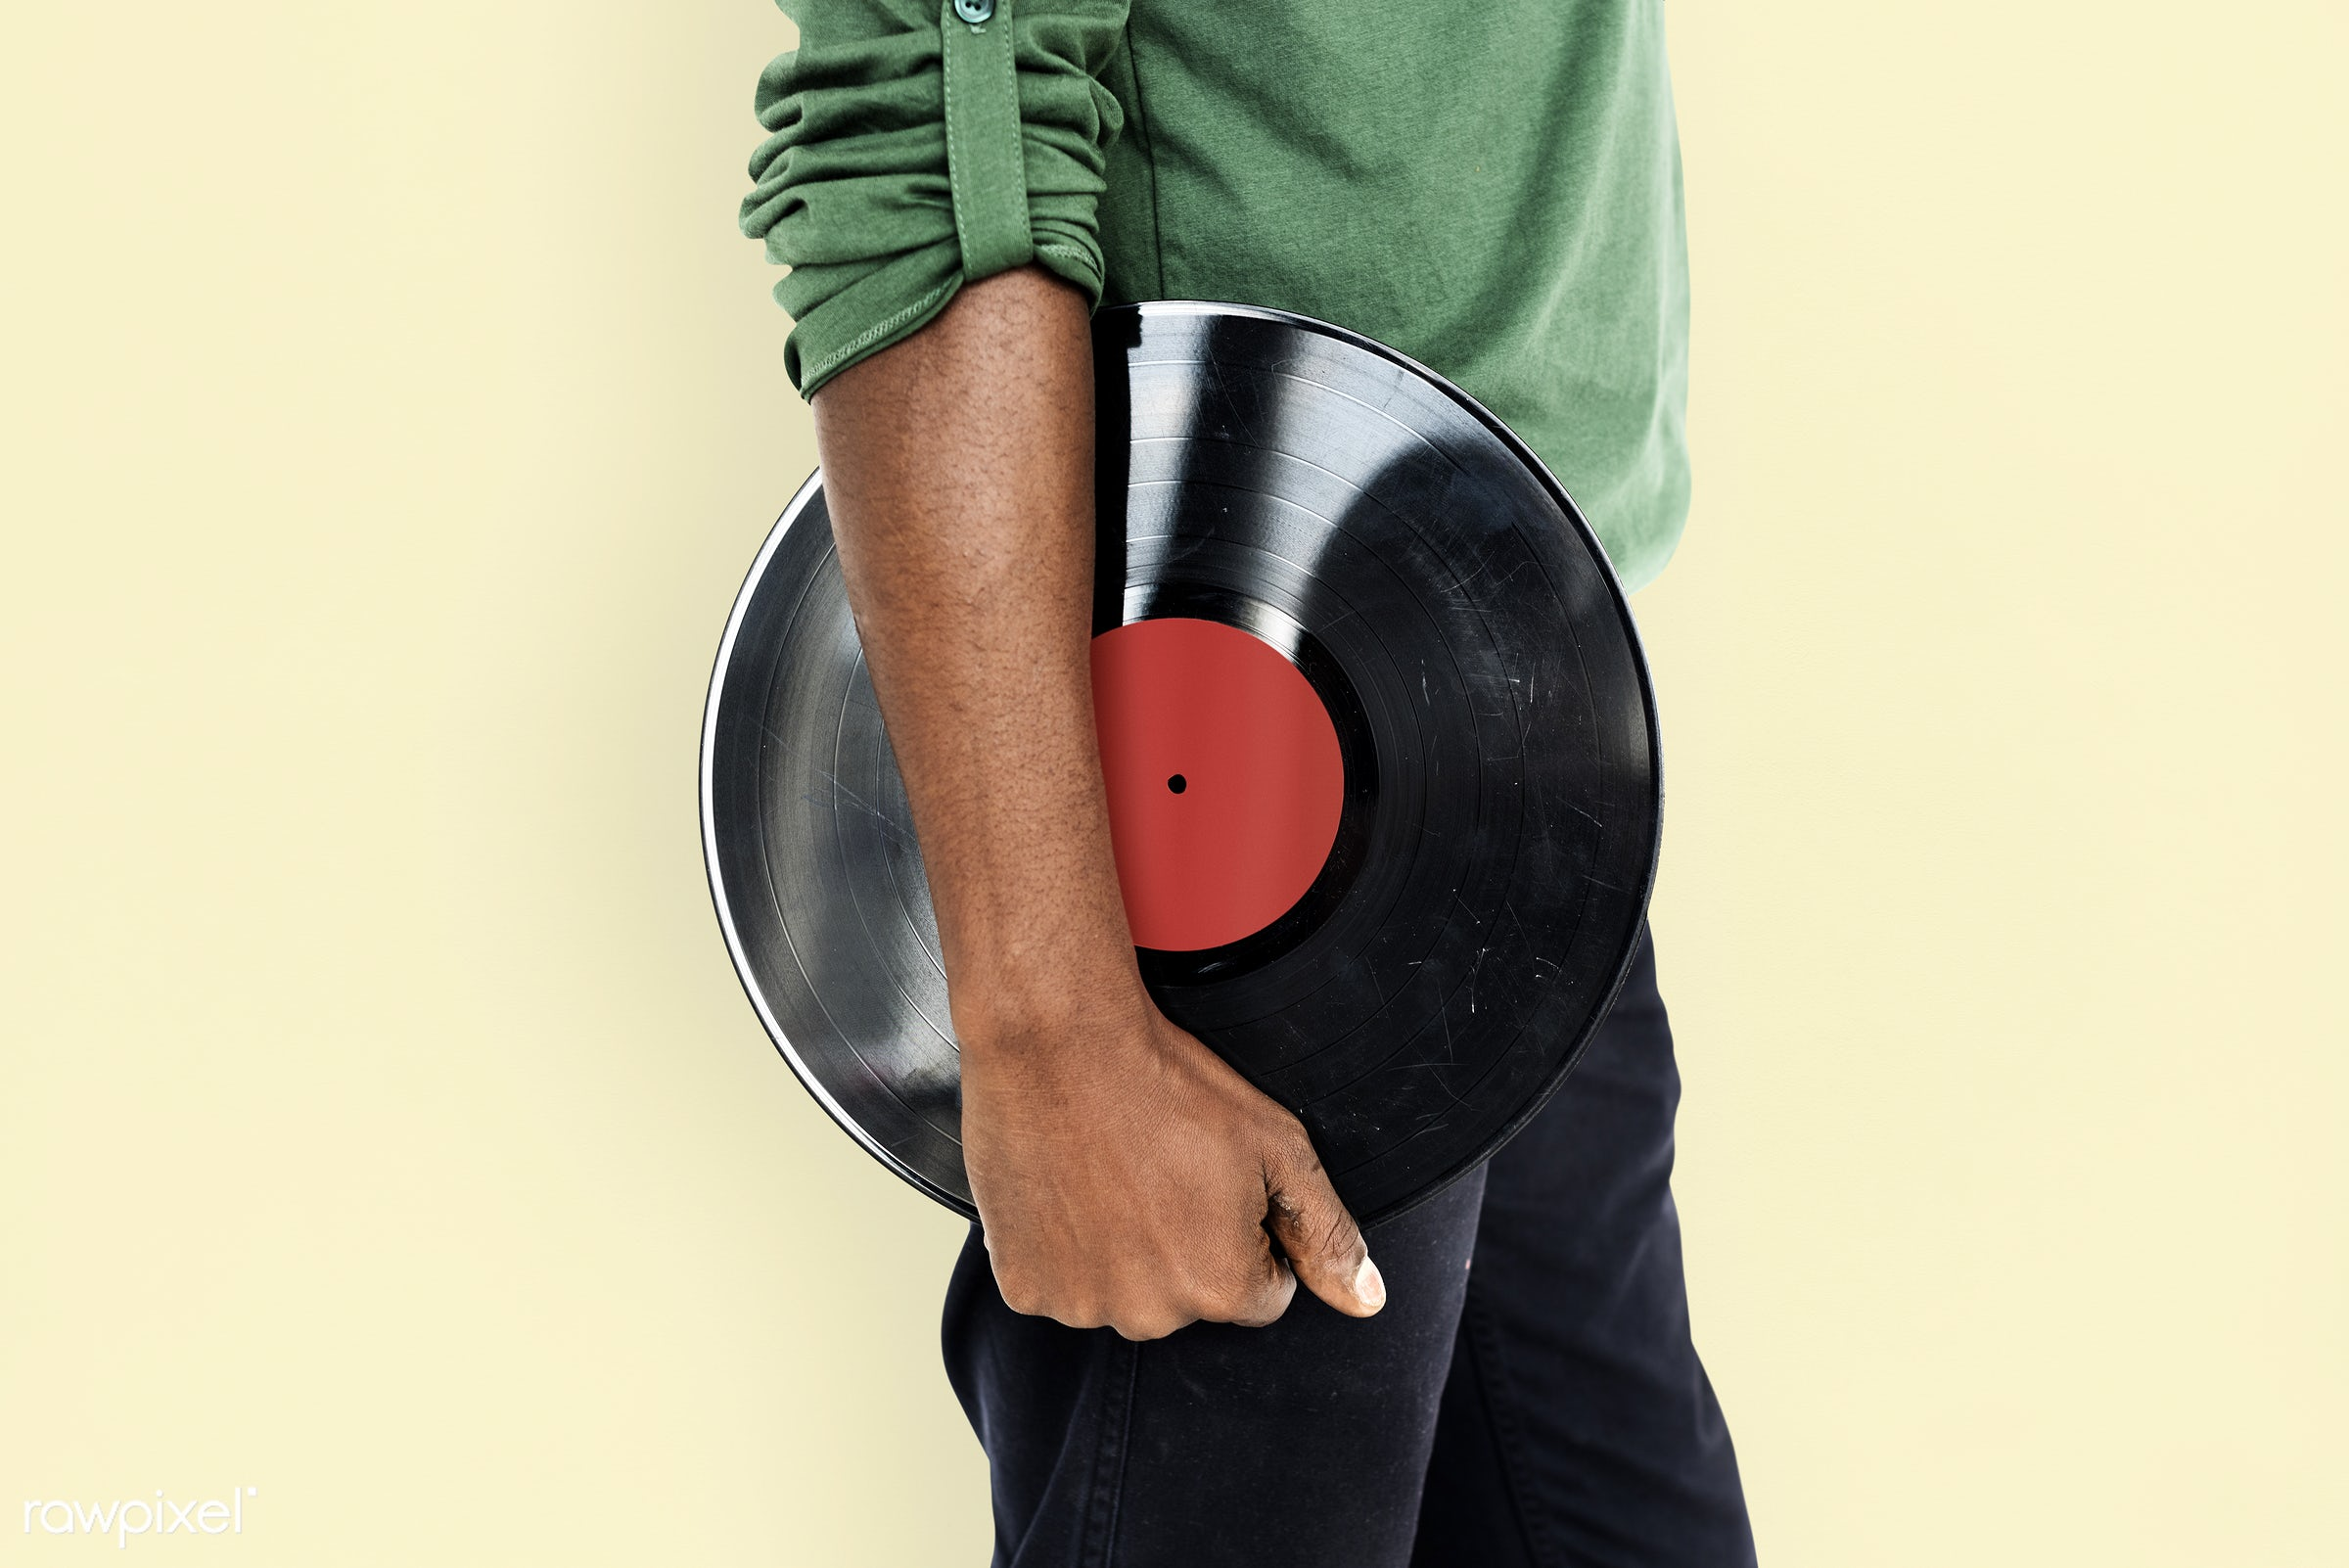 studio, expression, person, african, holding, retro, disc jockey, entertain, recreation, people, hand, casual, dj, vinyl,...